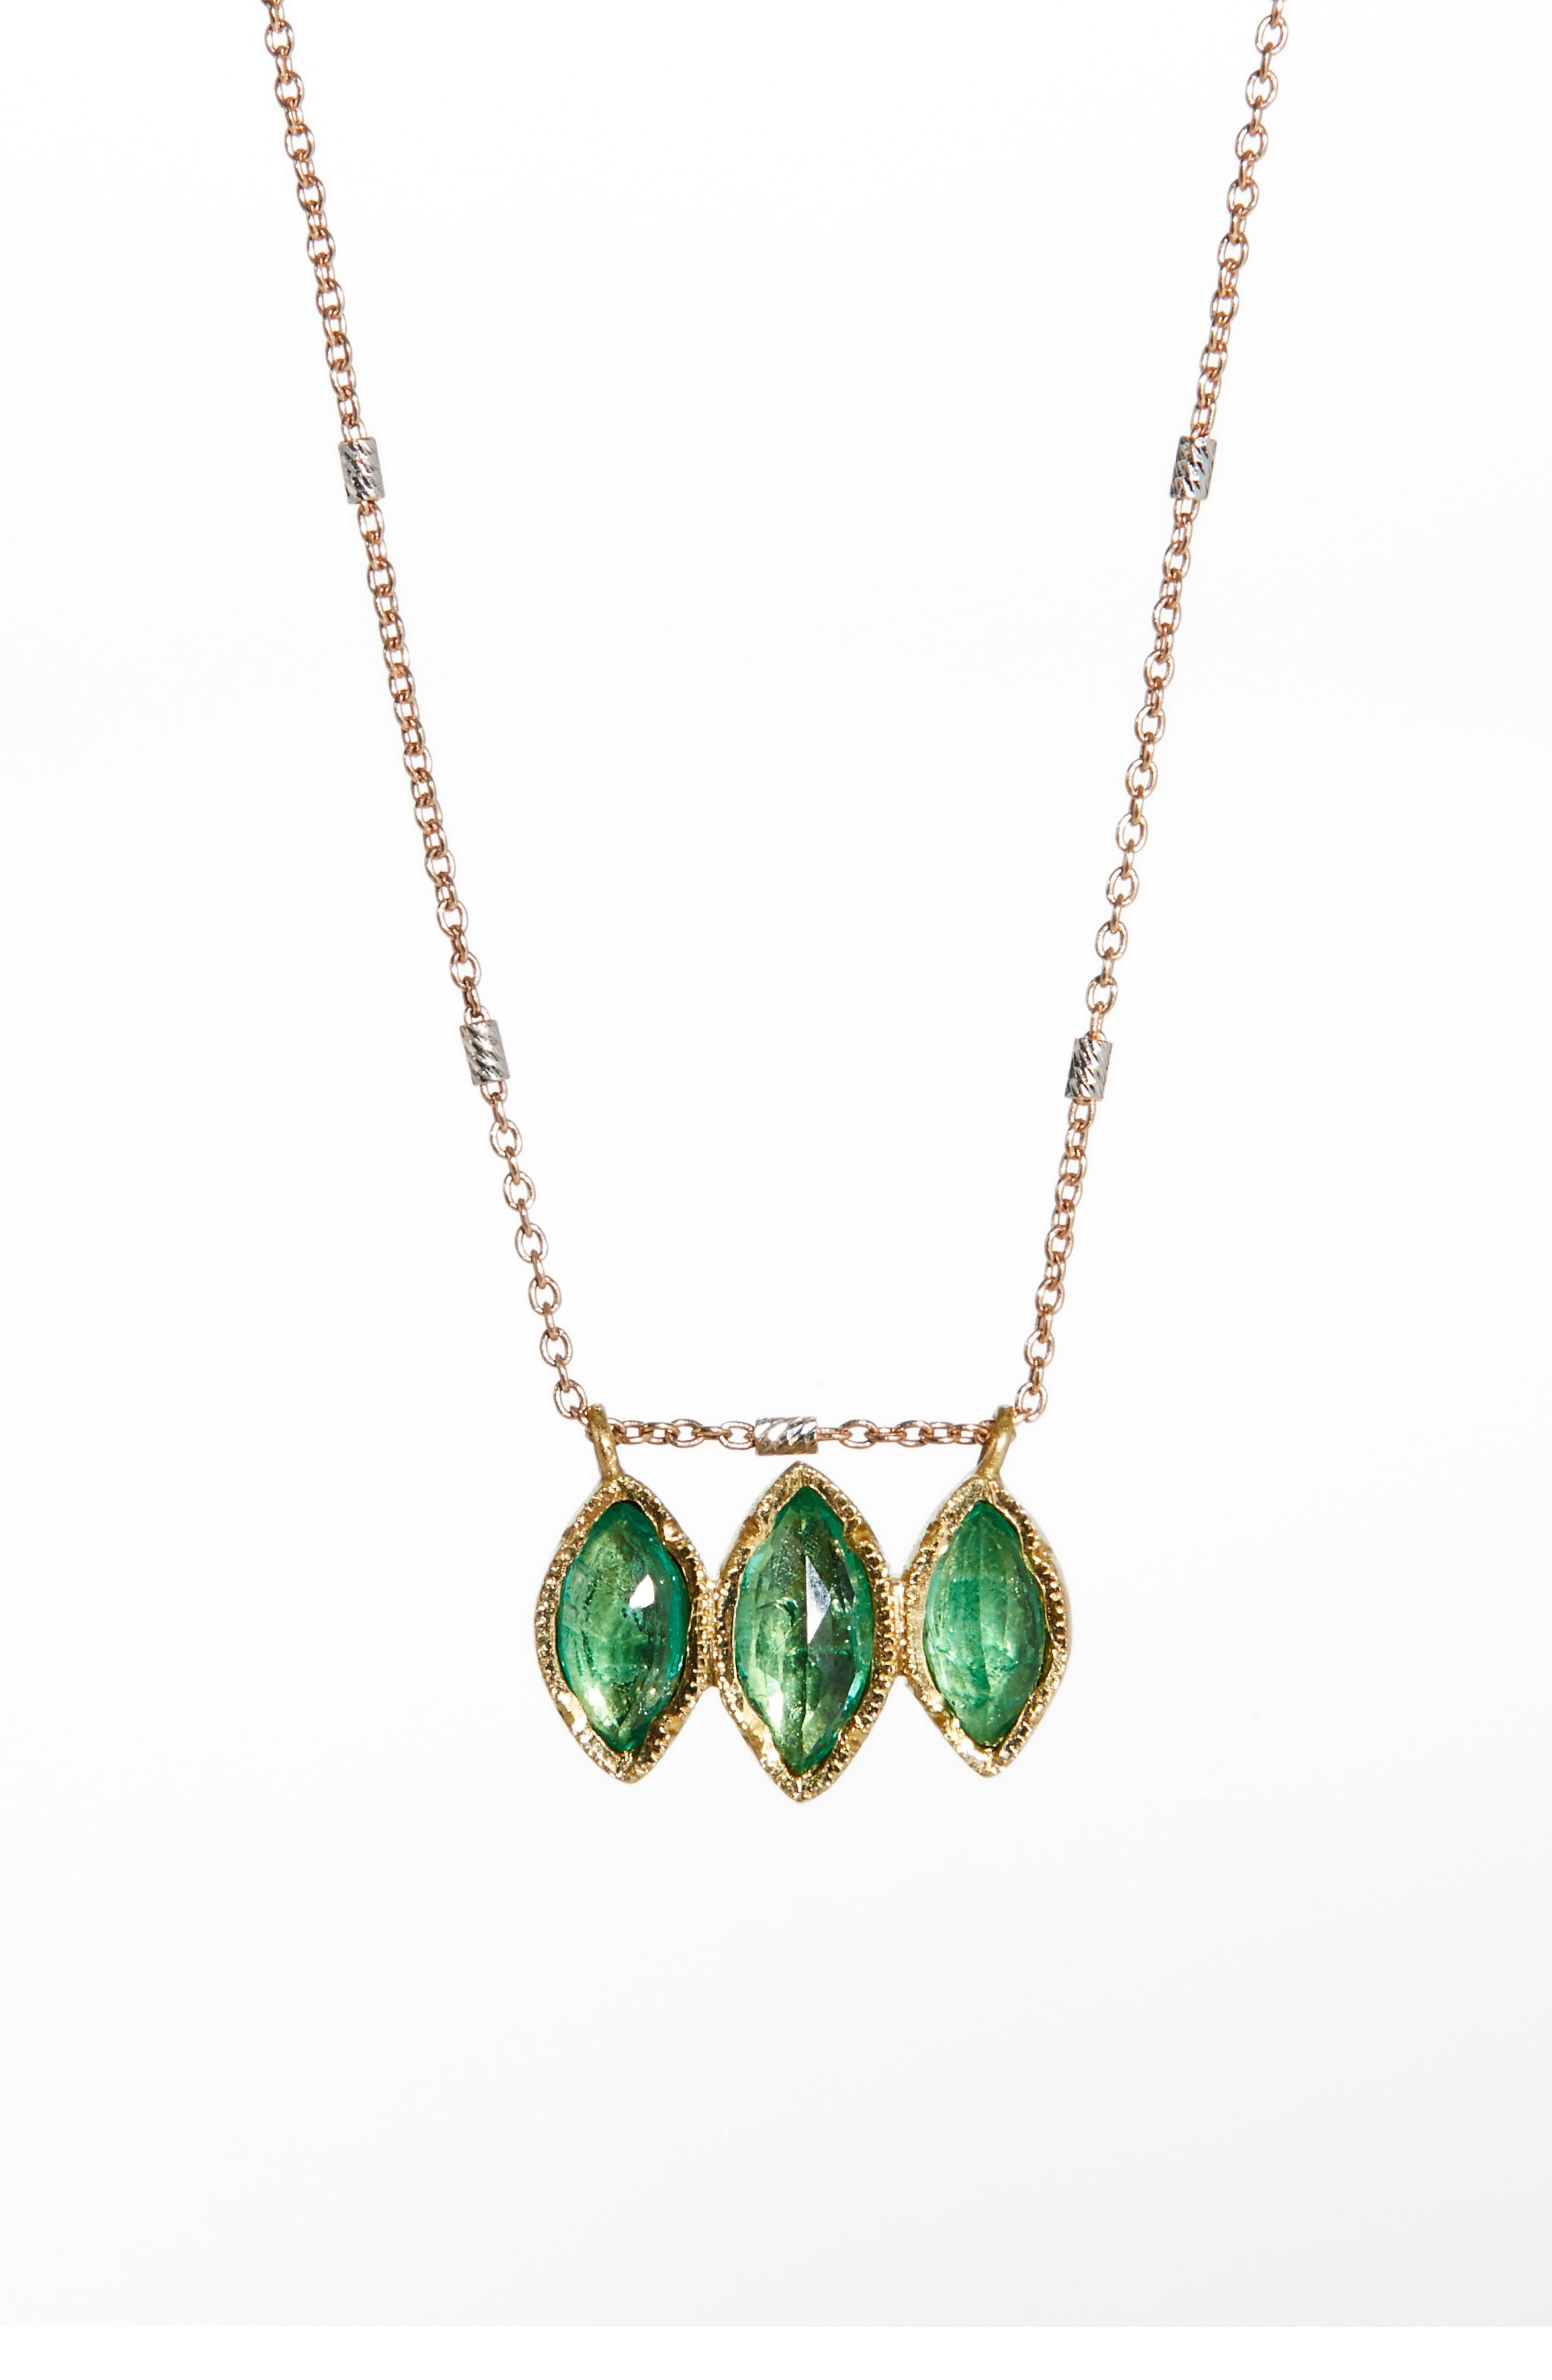 Brooke Gregson Dew Drop Marquise Emerald Necklace